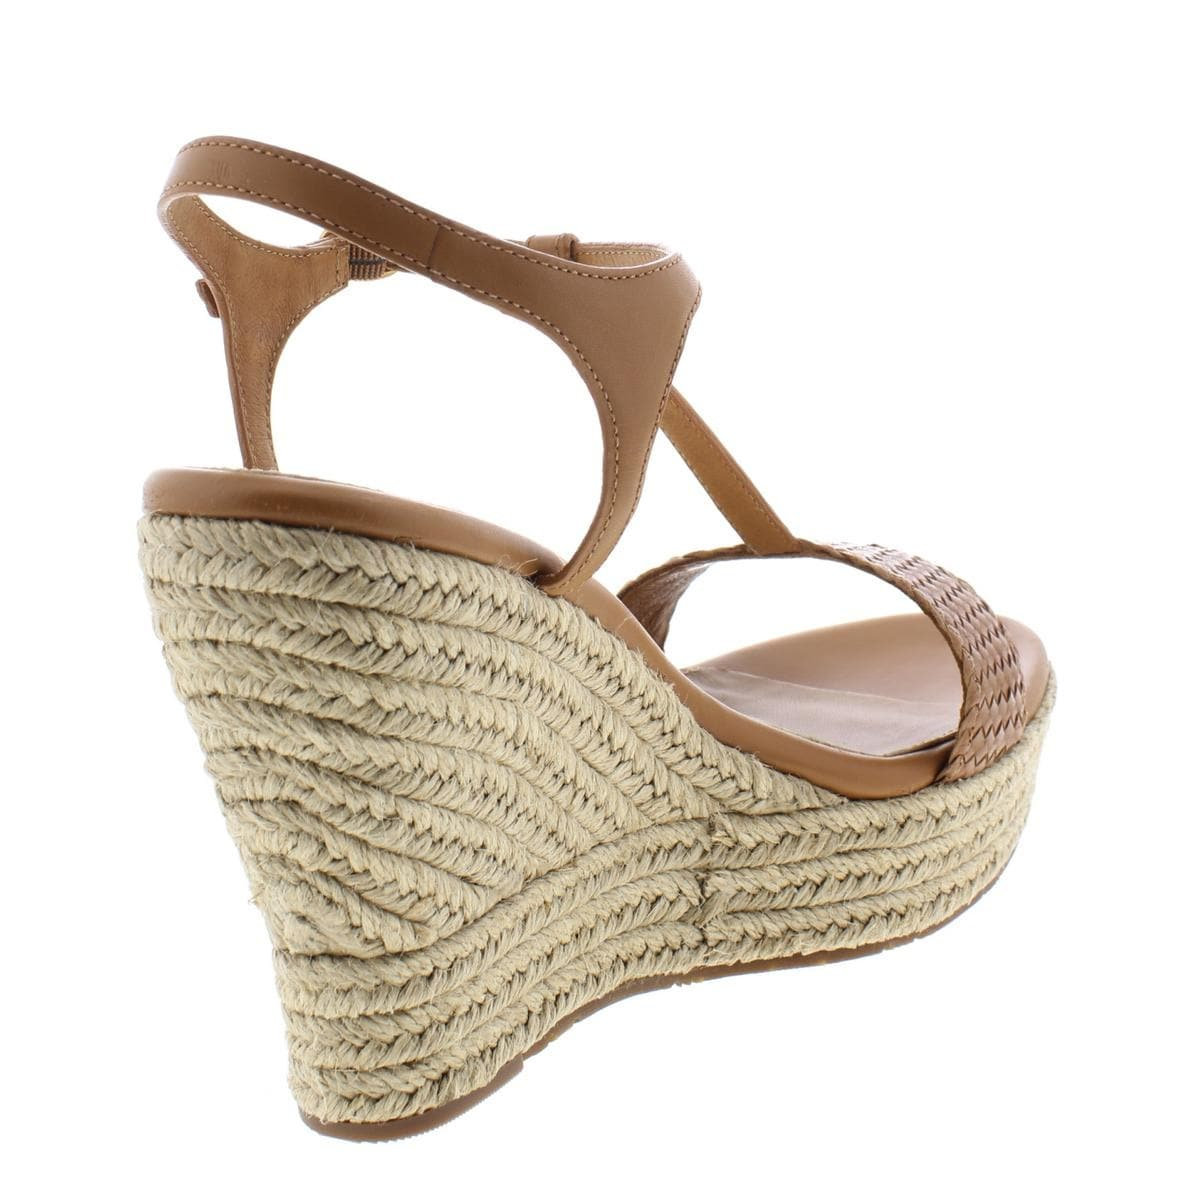 1b7ecf42bbf Ugg Womens Fitchie II Espadrilles Leather Sandals